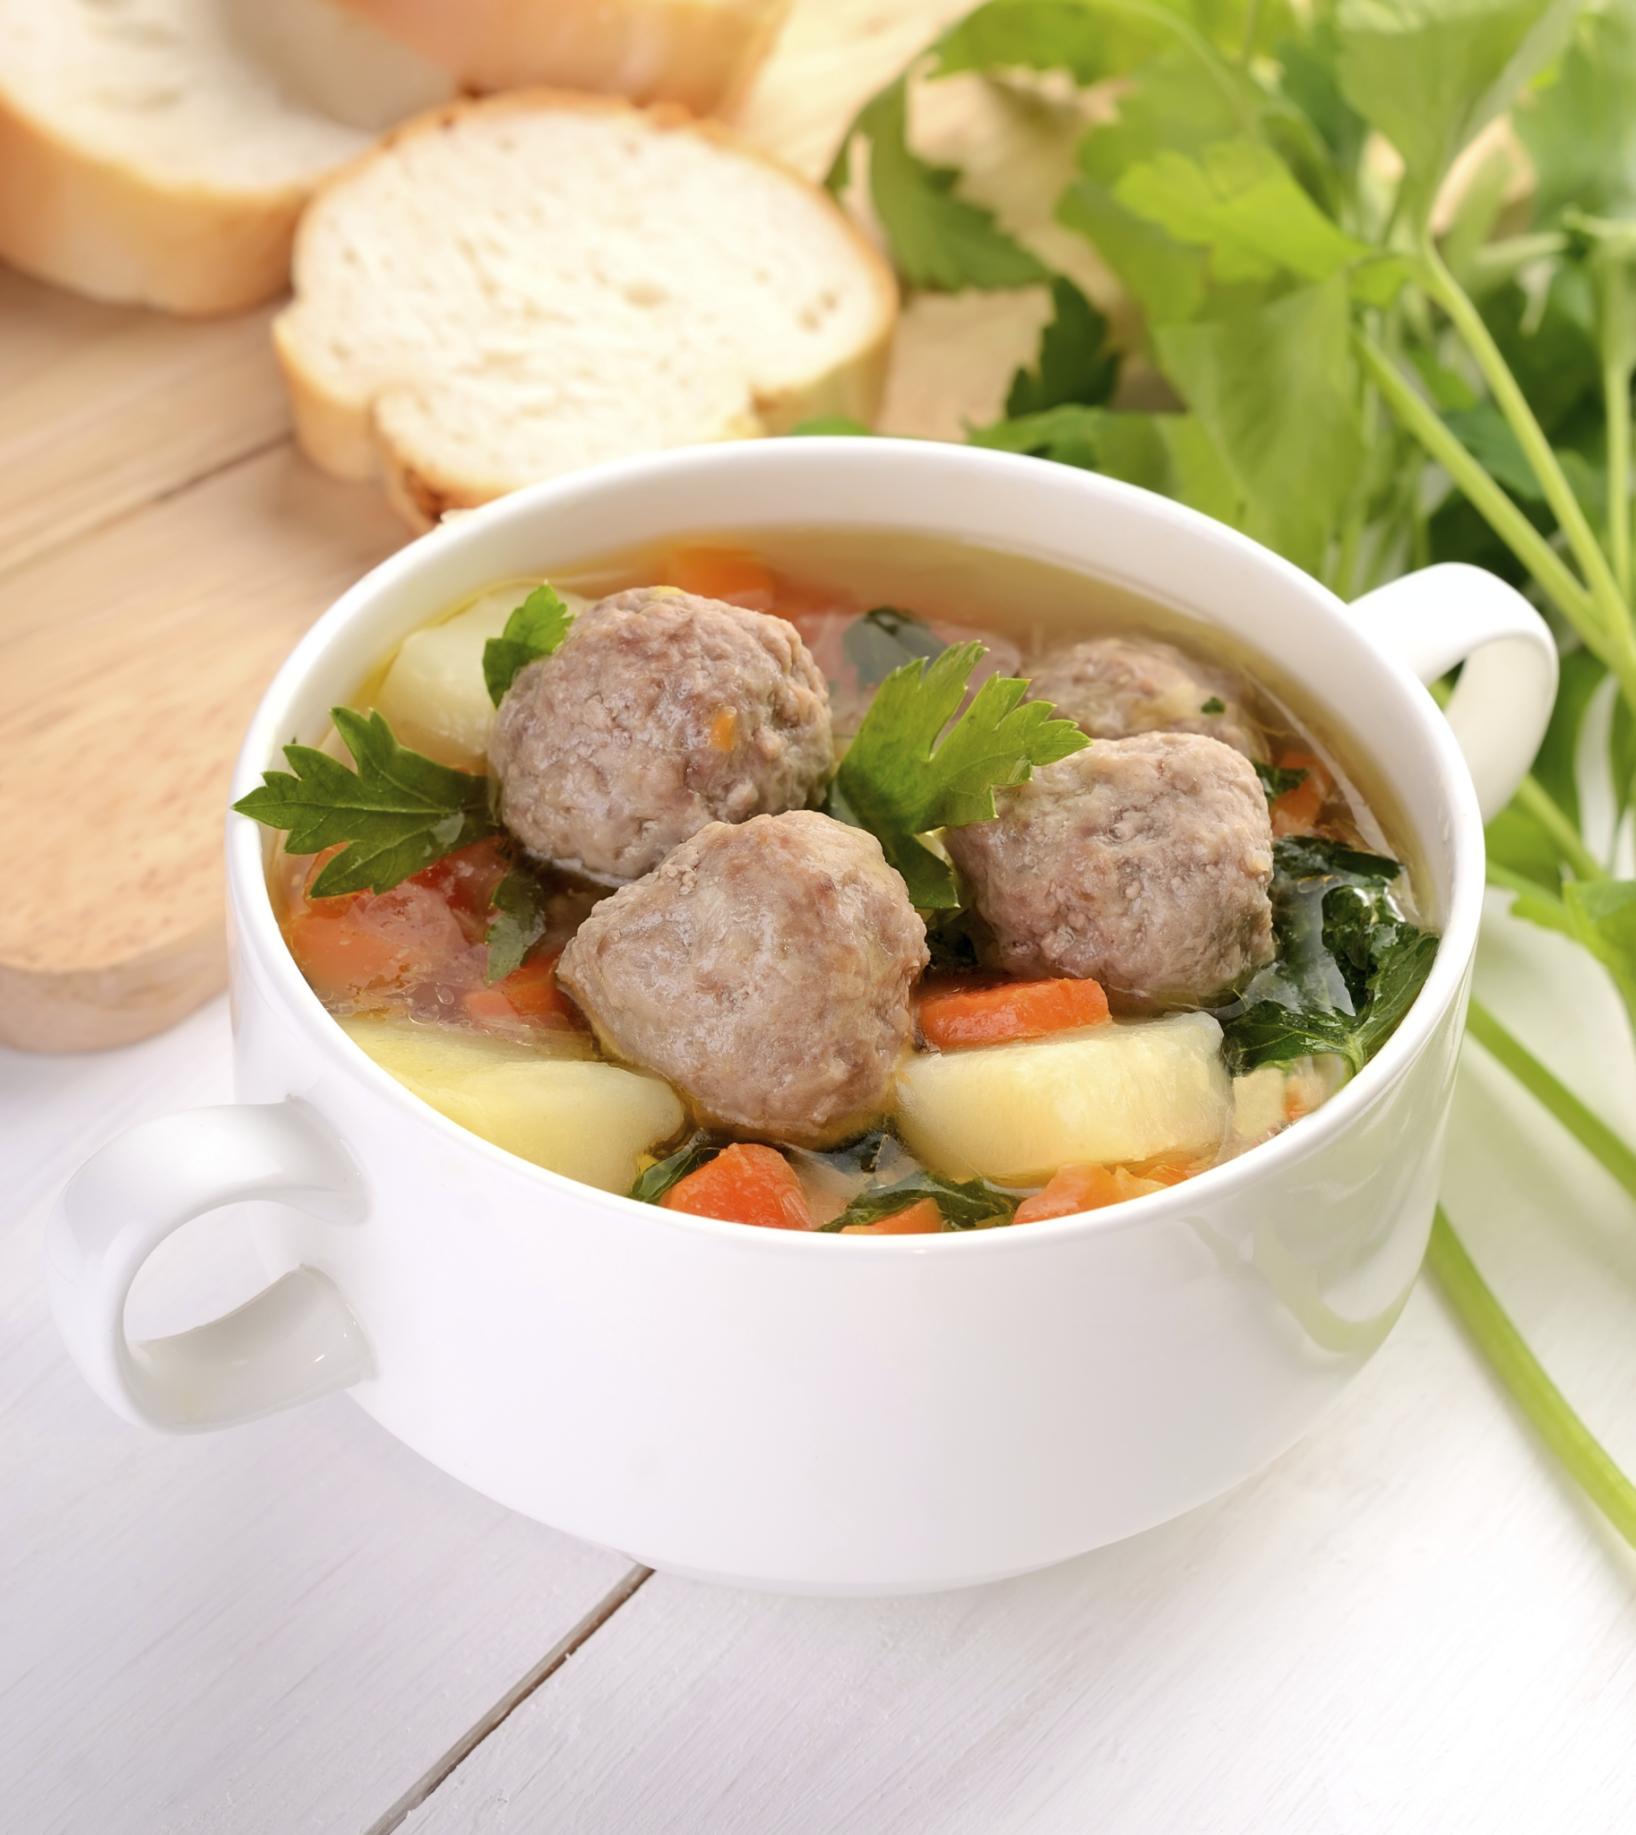 Sopa de verduras con pelotas de carne